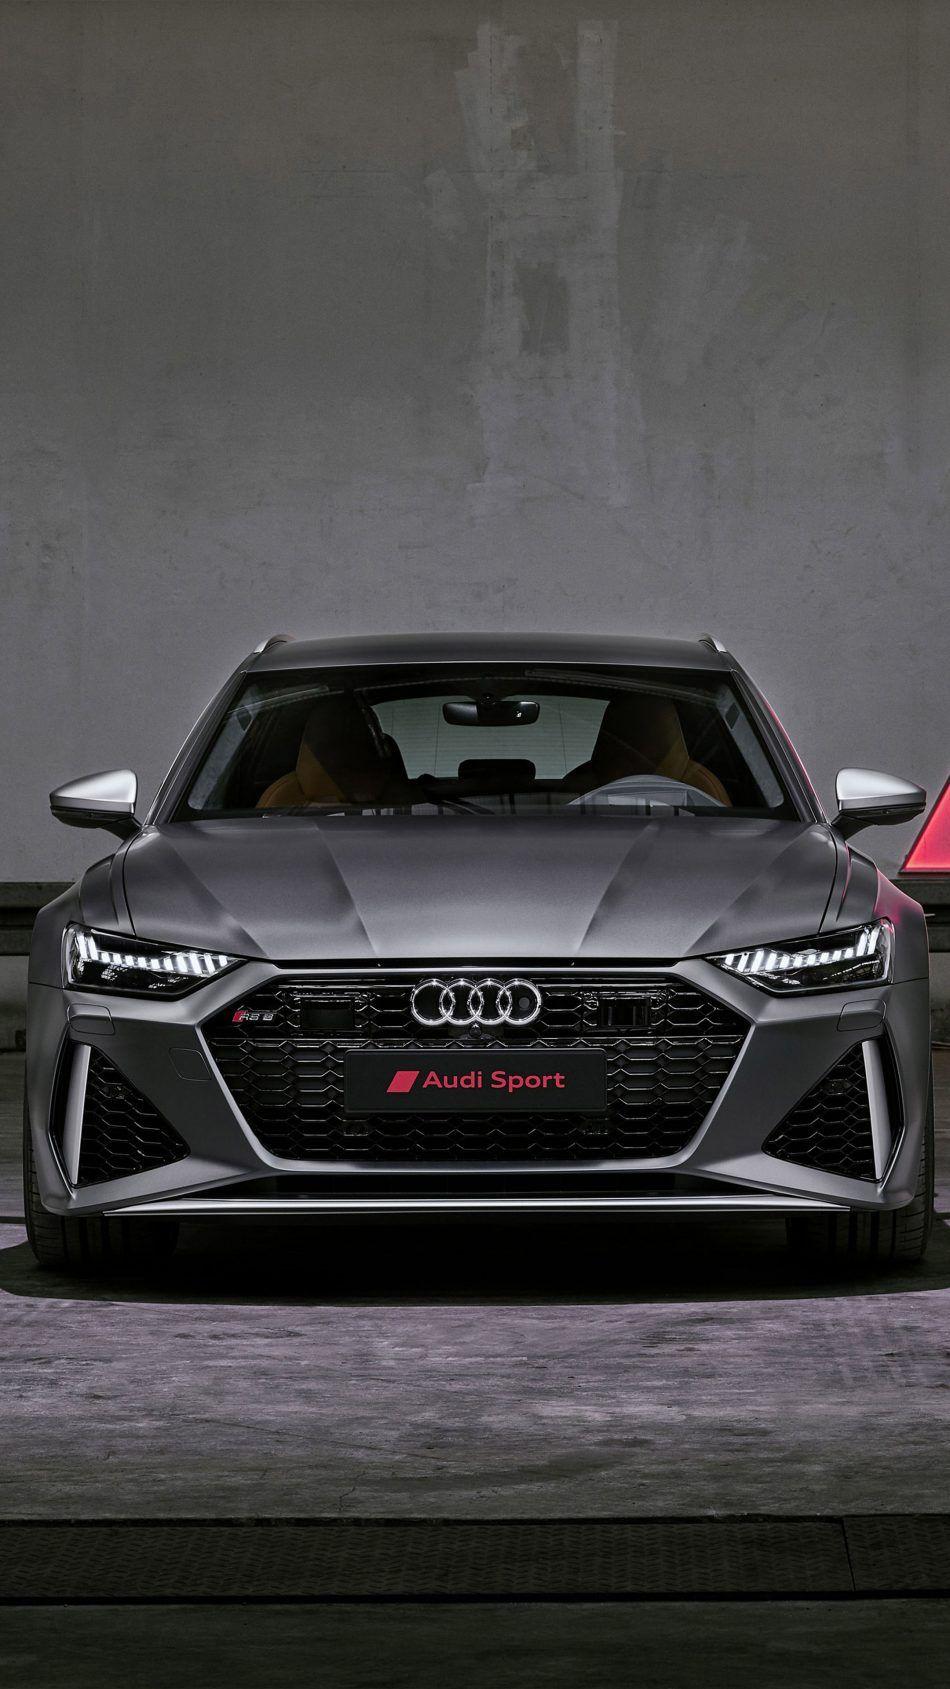 Audi Rs6 Avant 2020 Audi Rs6 Audi Super Sport Cars